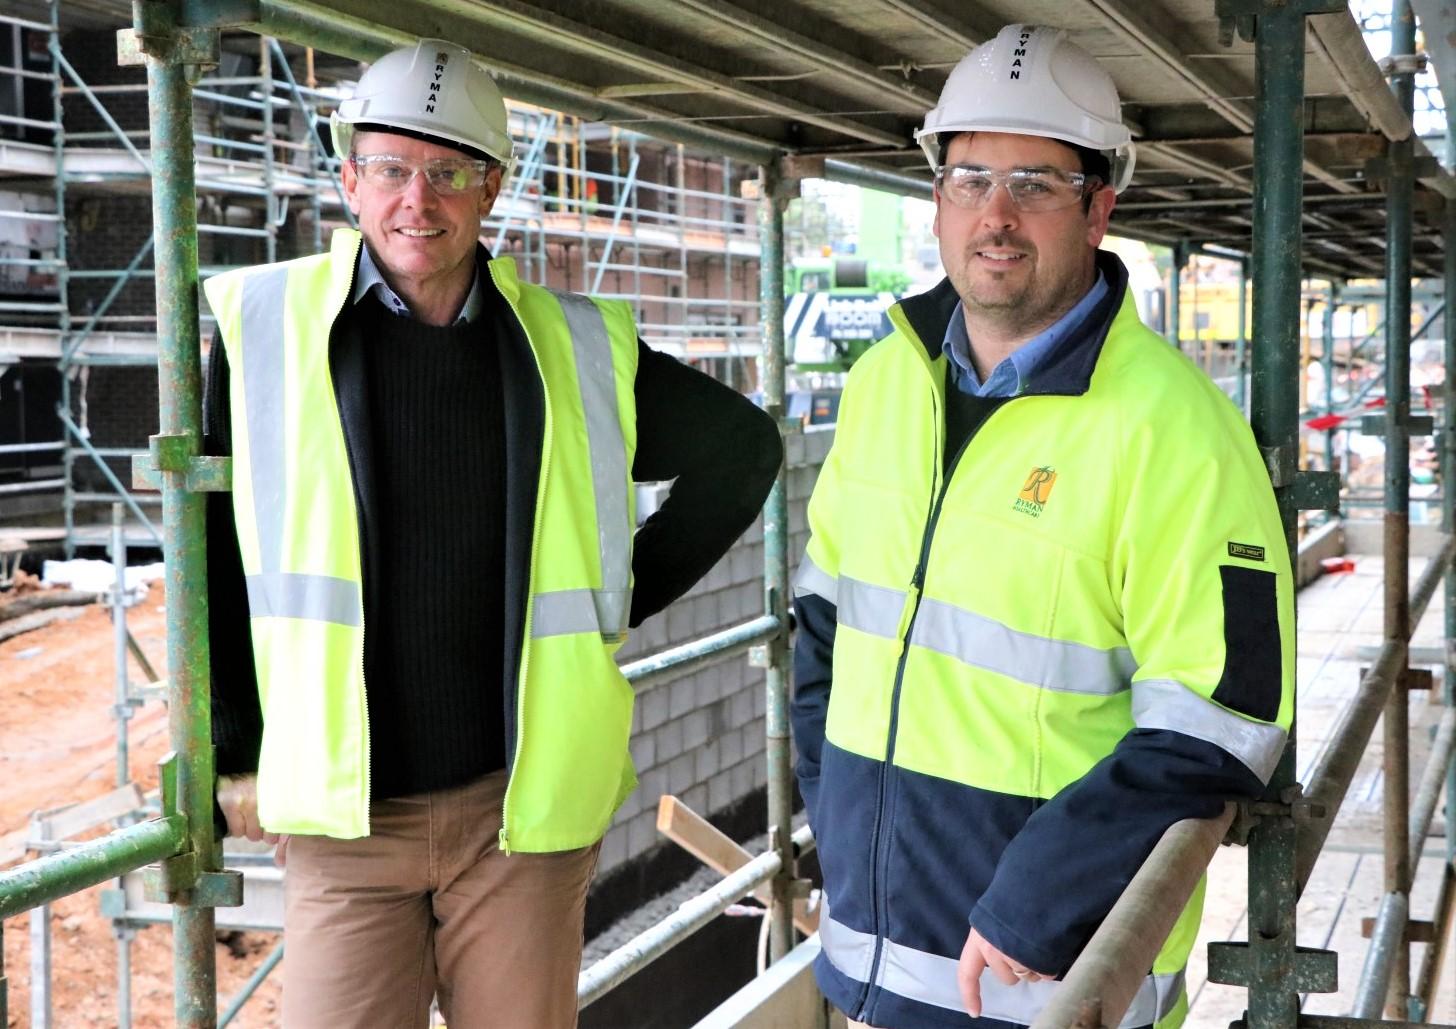 Profile: construction team